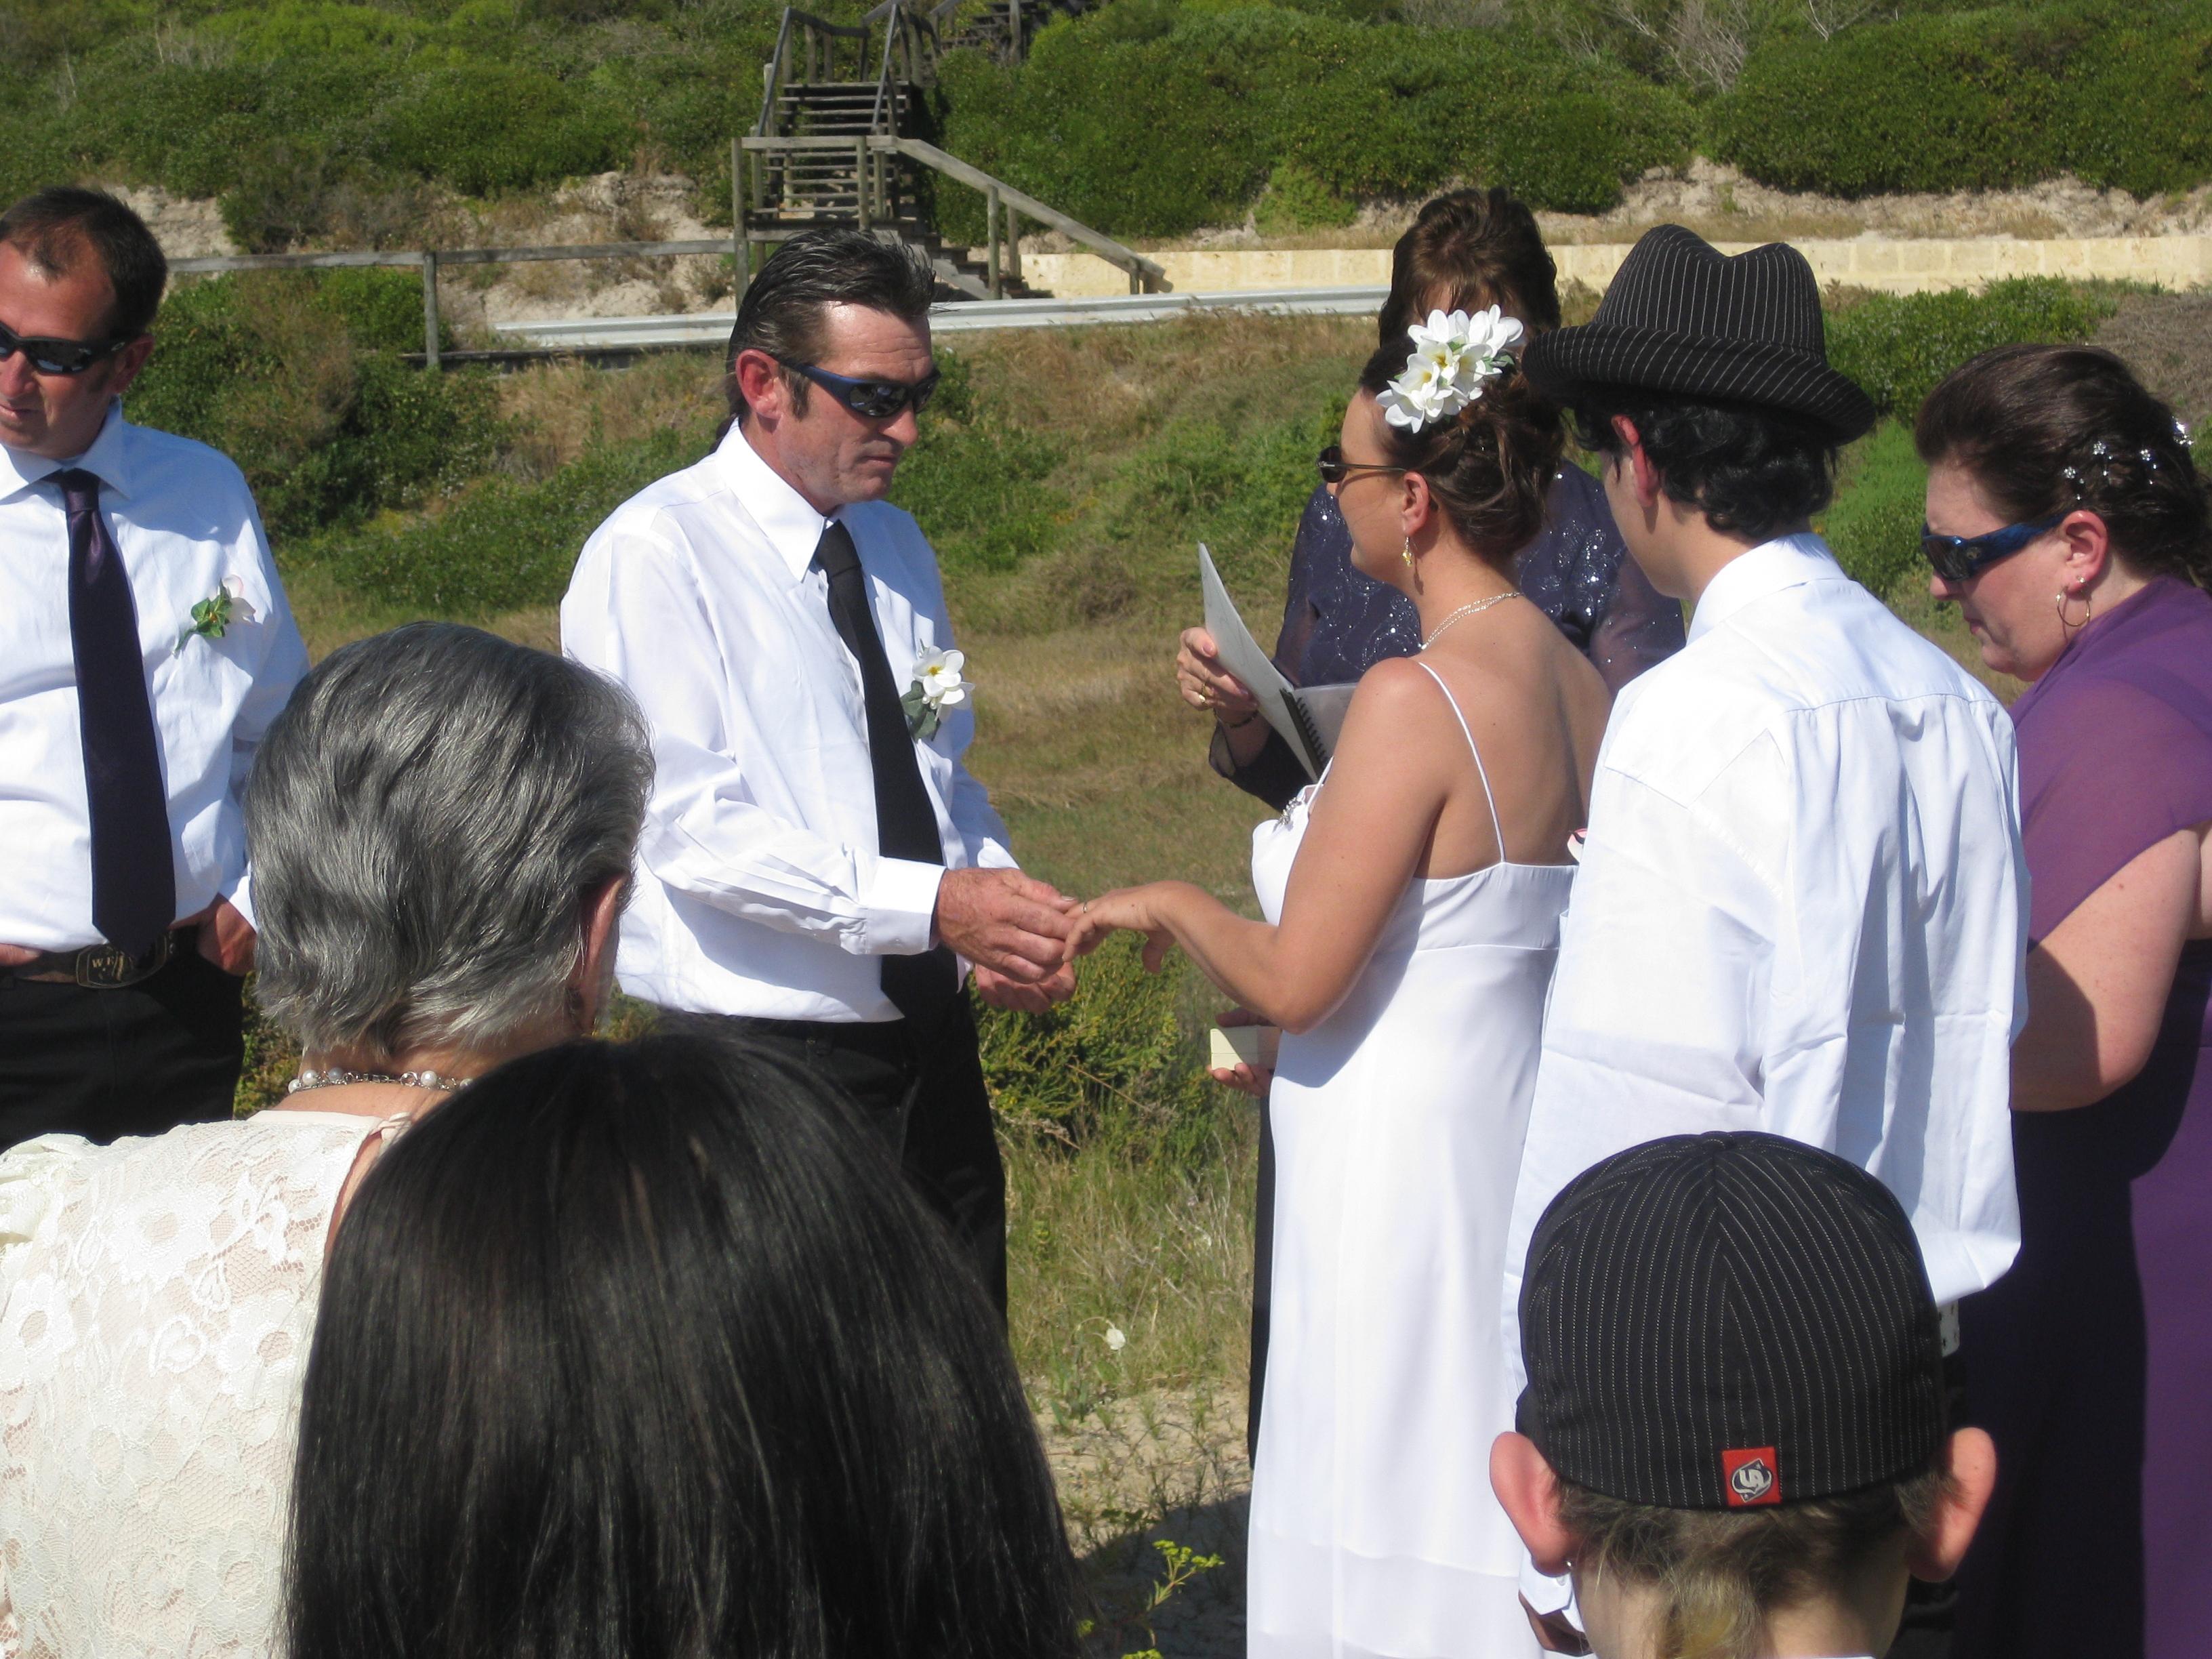 Geraldton River Wedding